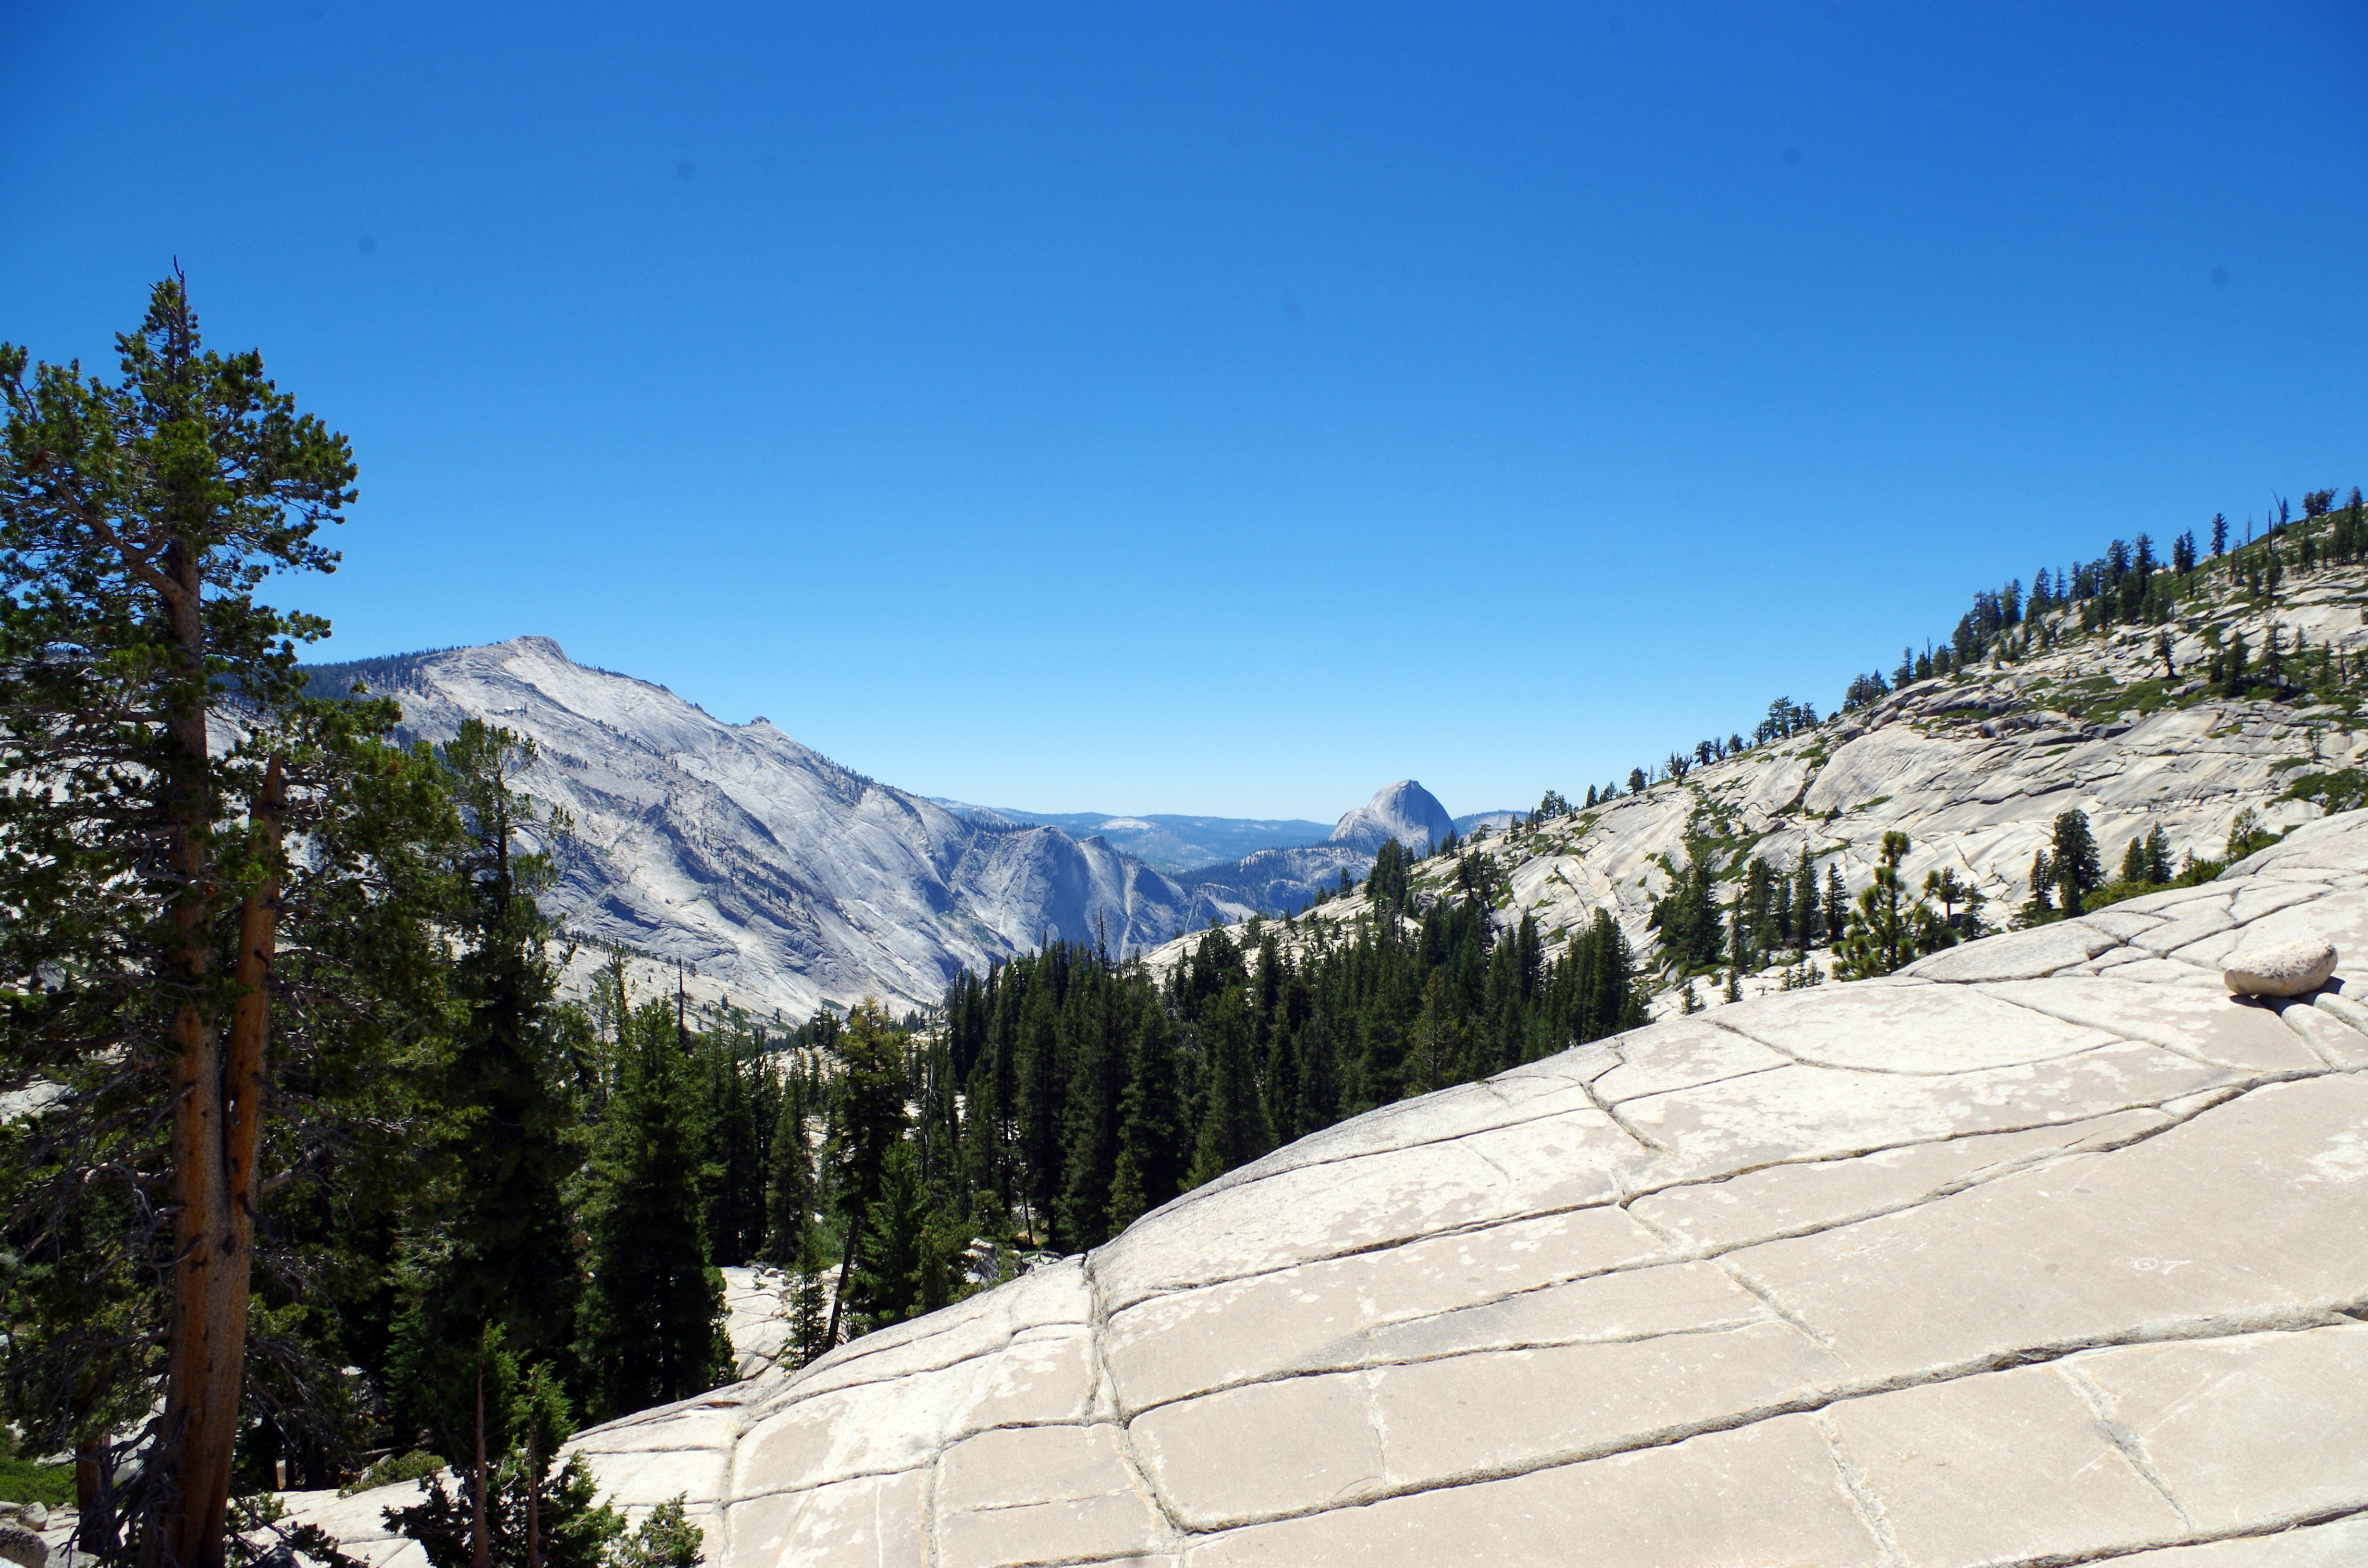 Atemberaubende Landschaften im Yosemite Nationalpark